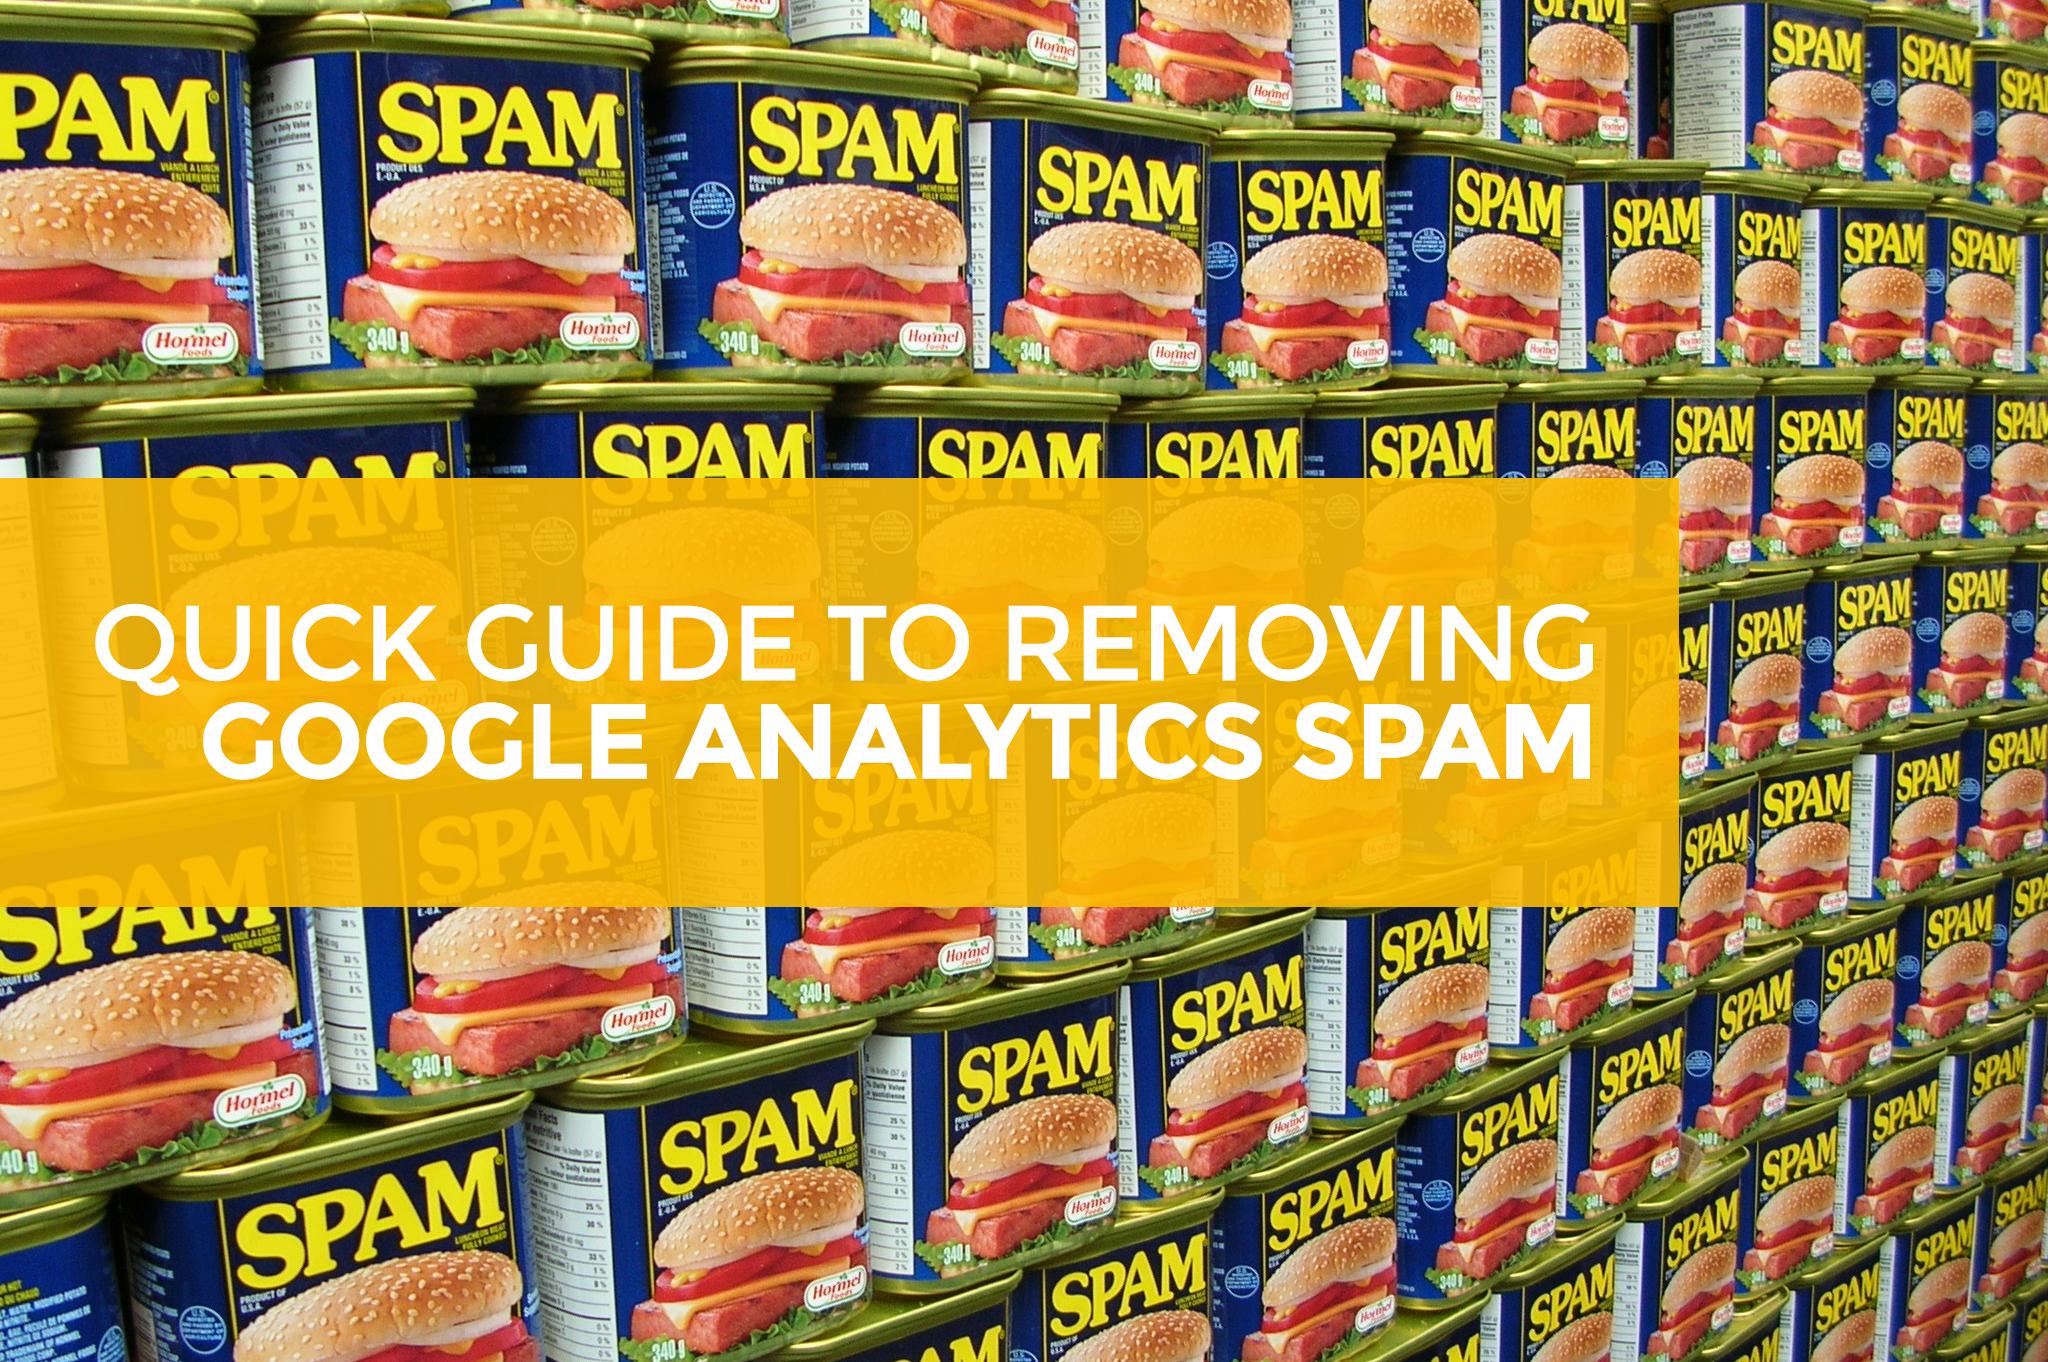 google-analytics-spam.png